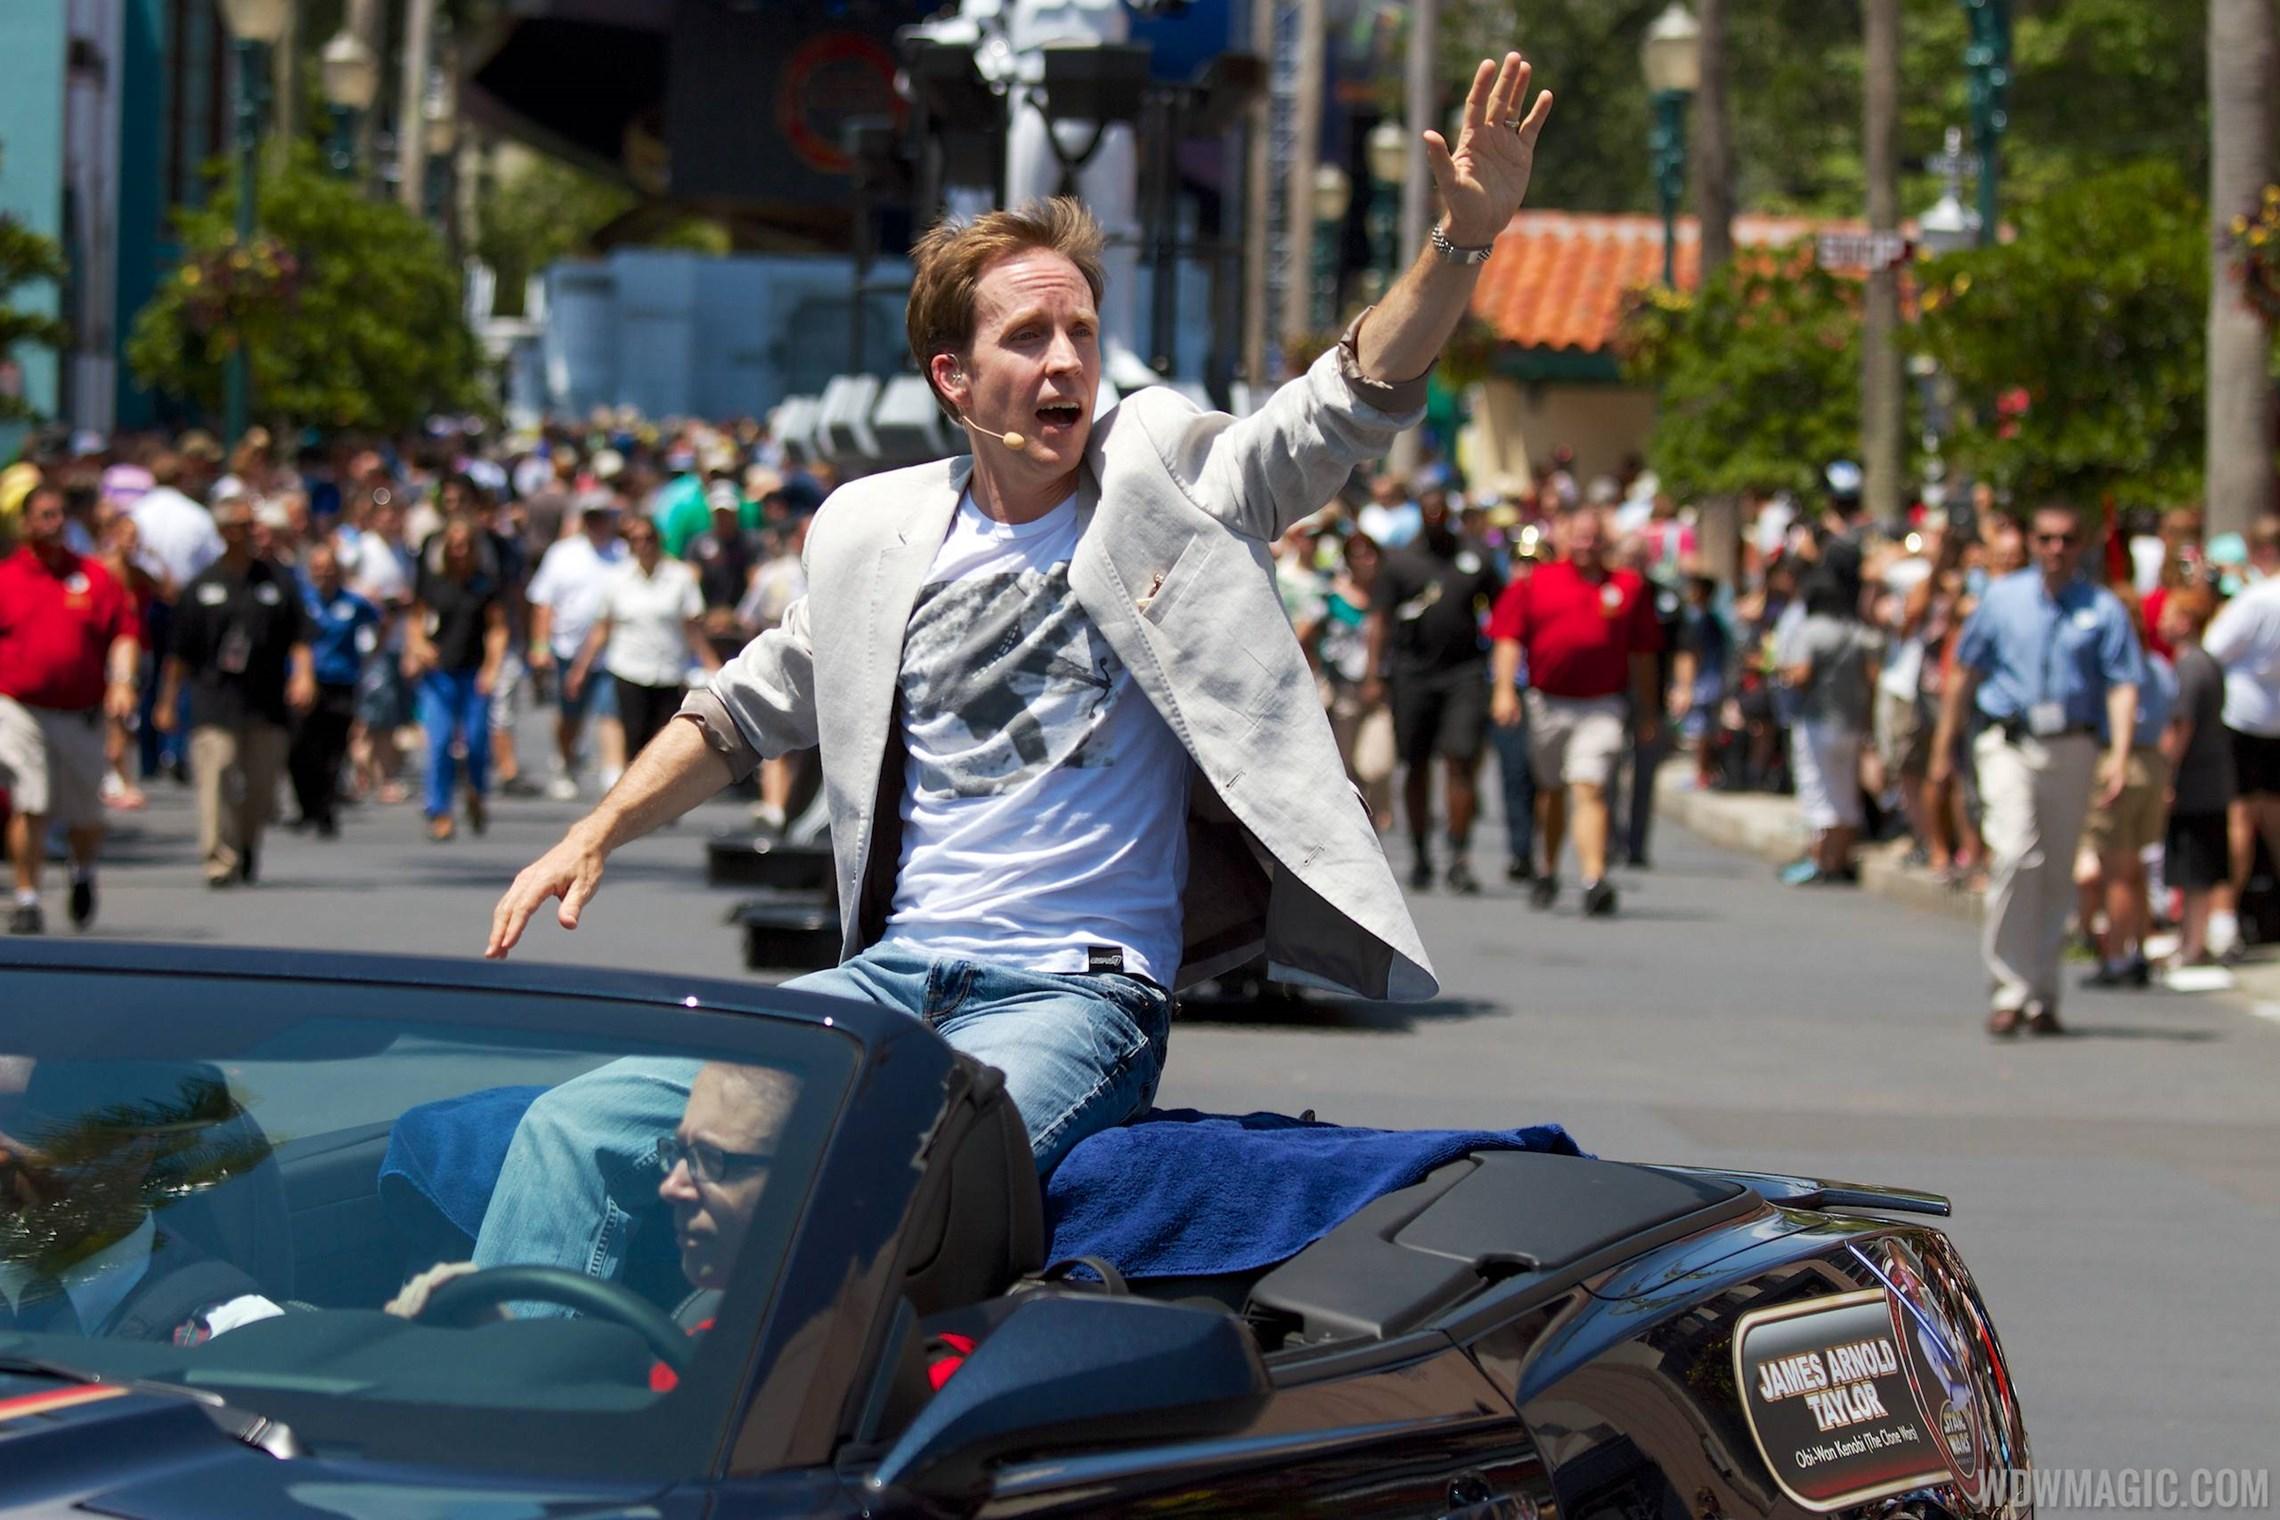 2014 Star Wars Weekends - Weekend 4 Legends of the Force motorcade celebrities